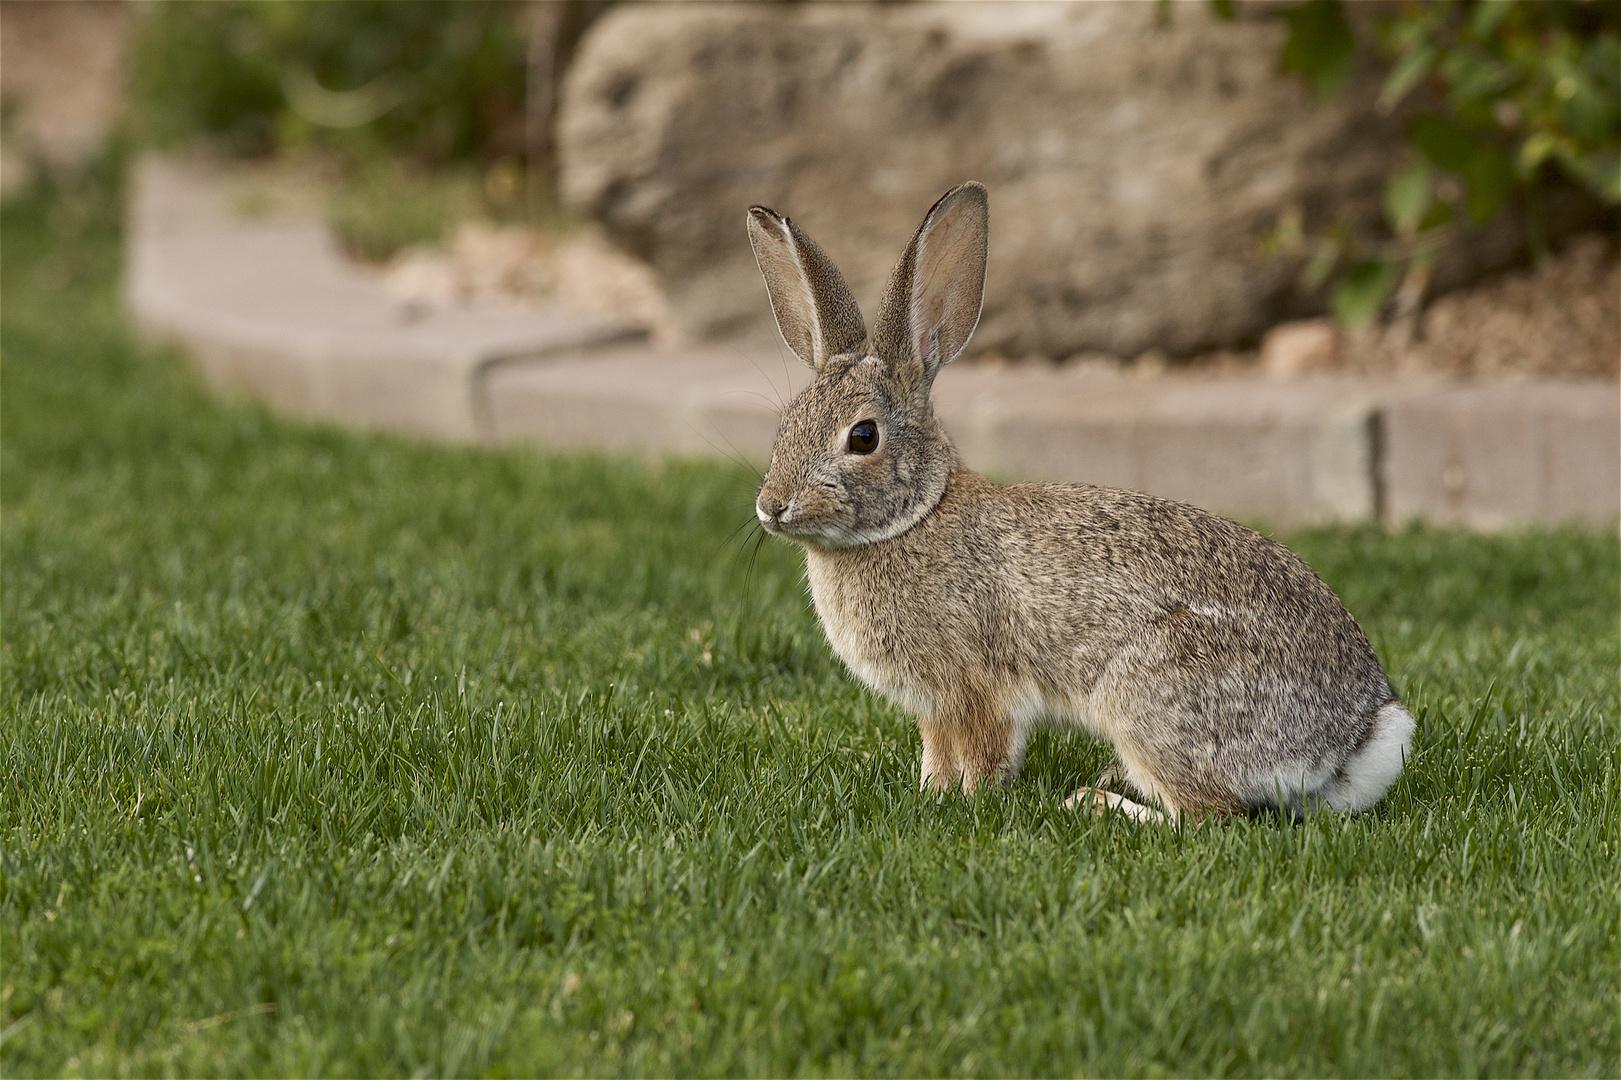 Easterbunny in my yard.